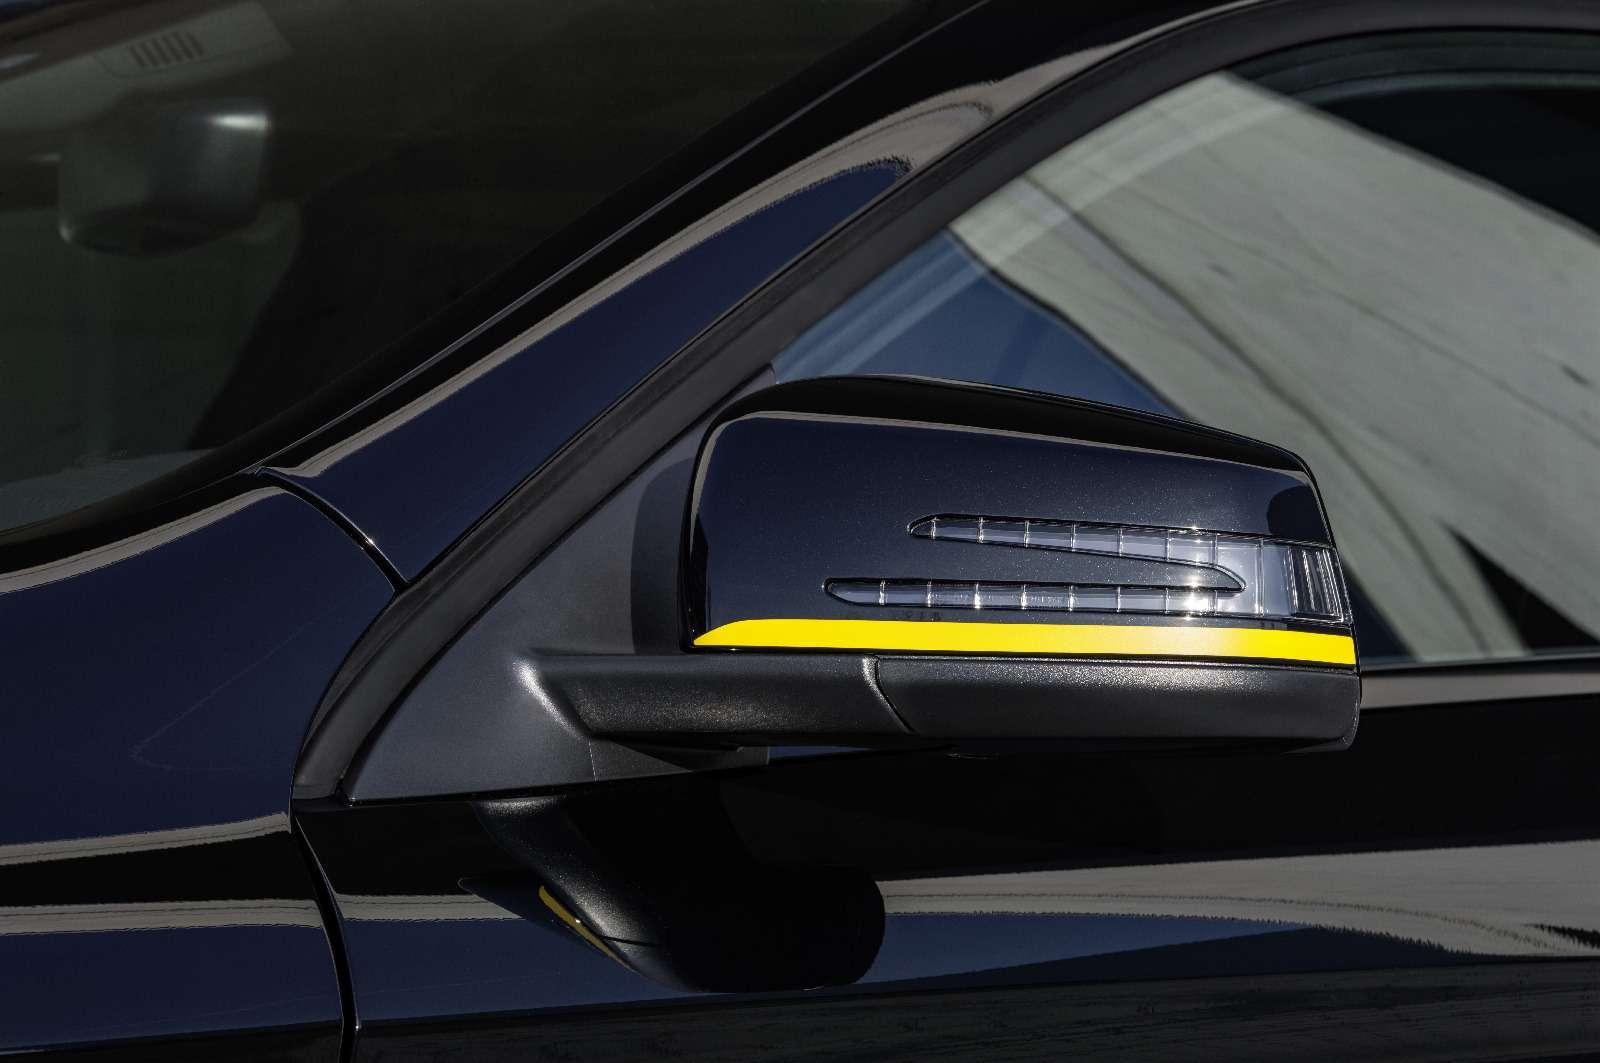 Mercedes-Benz GLA стал краше, ноне просторнее— фото 690080